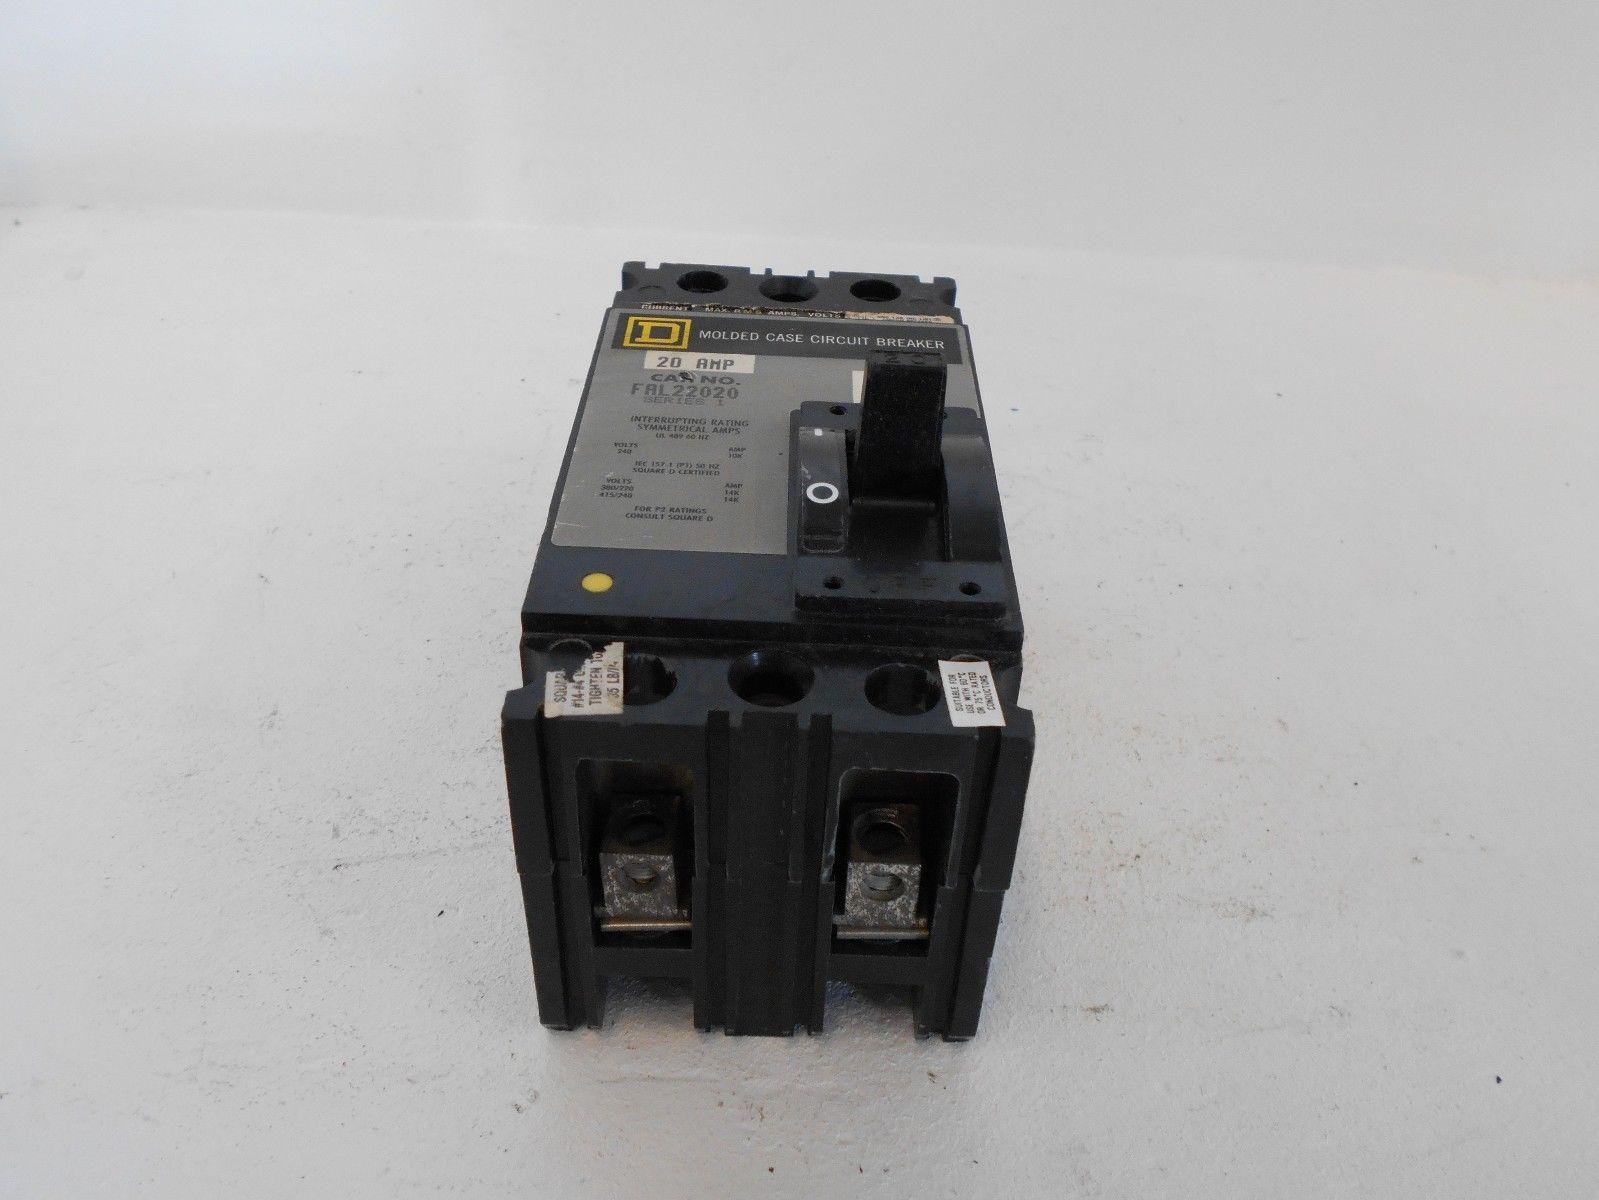 Square D Bolt On Circuit Breaker 20 Amp Qo 120 Nemetas 240 Volt Wiring Diagram Fal22020 2 Pole 10k Molded Case Rh Poweredelectricsupply Com